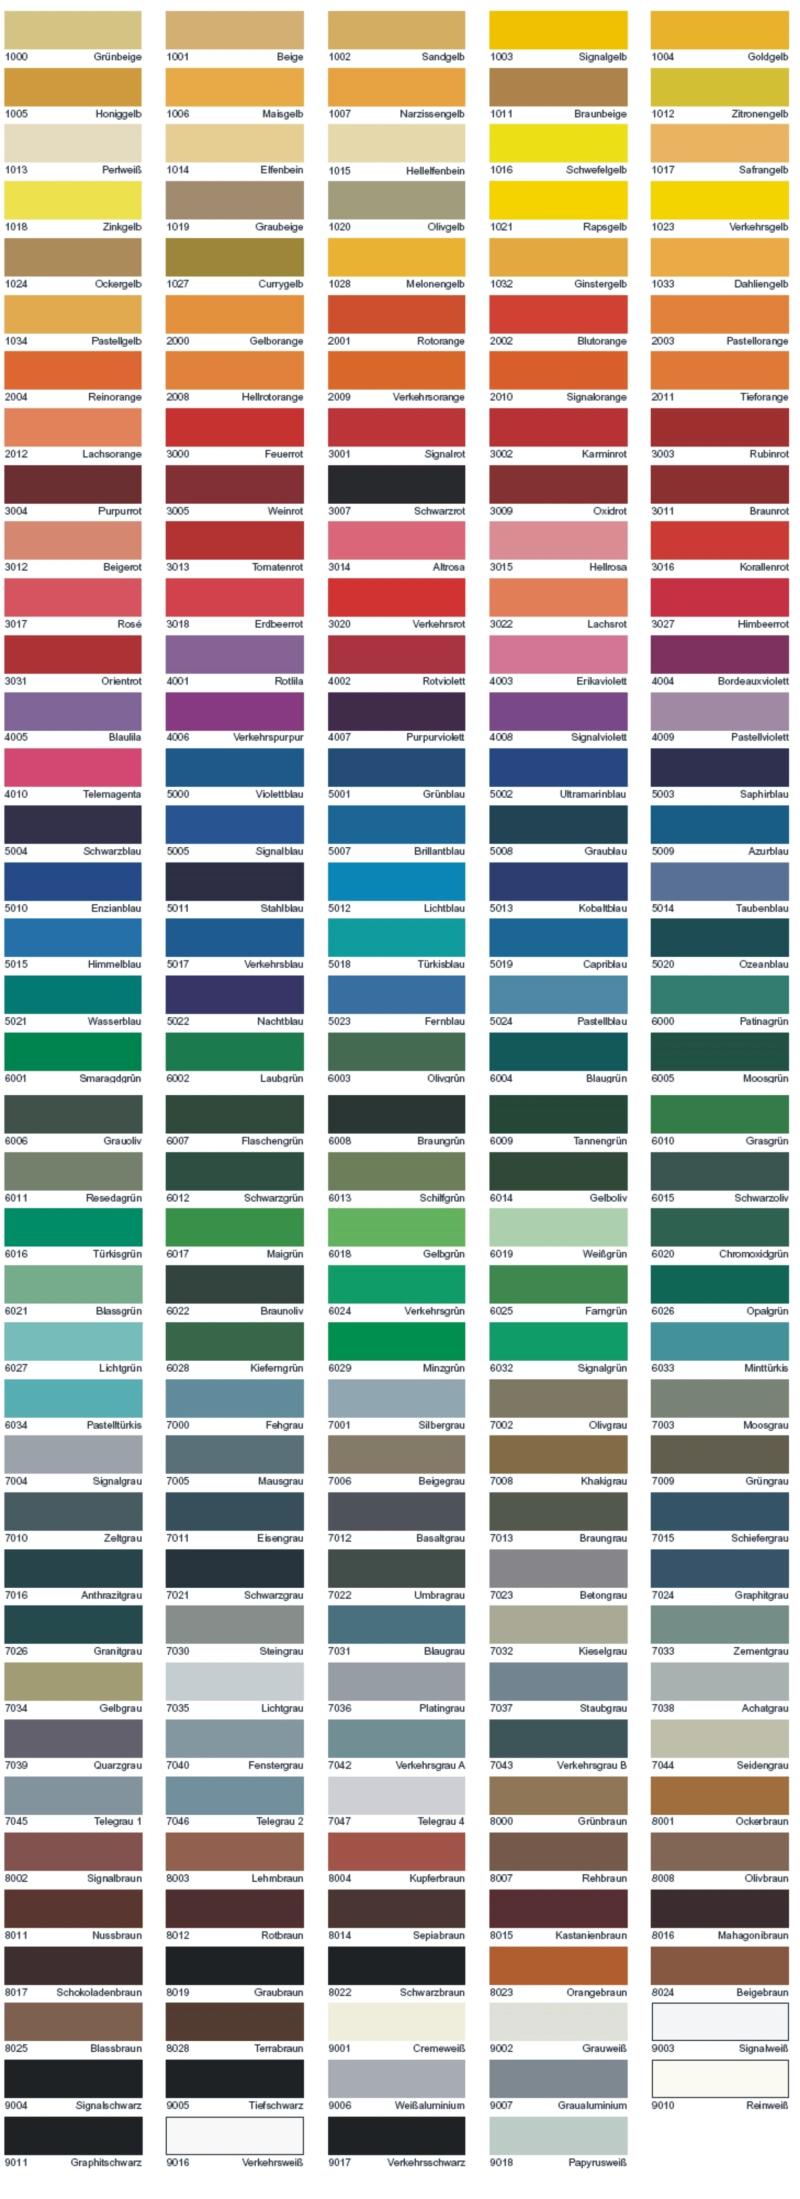 brillux lacryl pu seidenmattlack 270 750 ml ebay. Black Bedroom Furniture Sets. Home Design Ideas